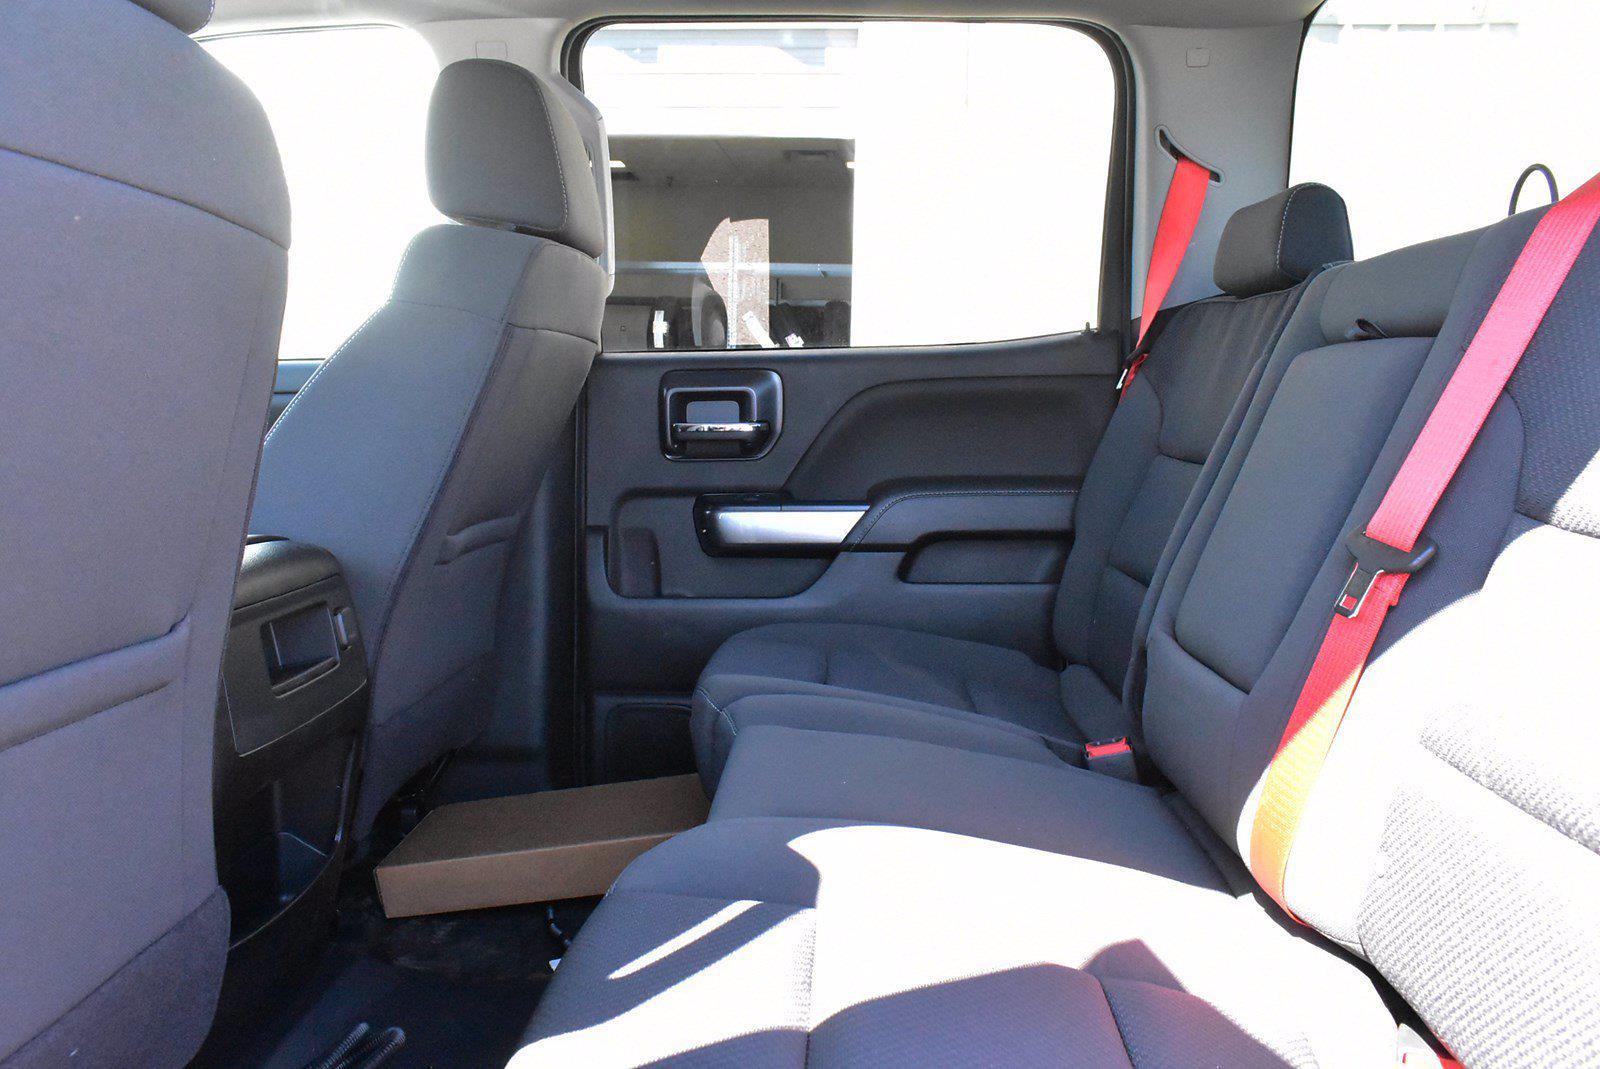 2020 Chevrolet Silverado 5500 DRW 4x2, Cab Chassis #D100225 - photo 8